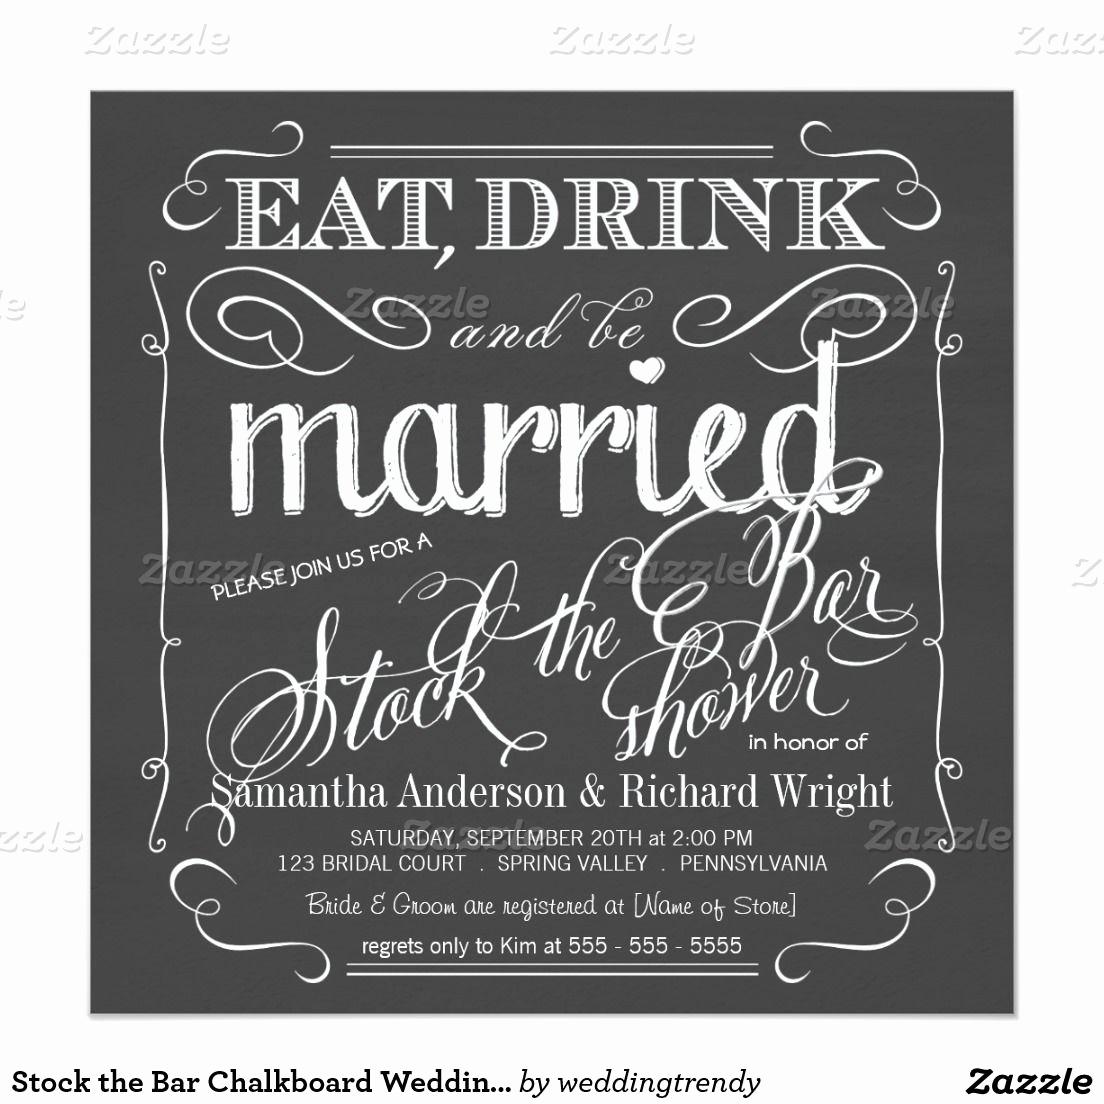 Stock the Bar Invitation Luxury Stock the Bar Chalkboard Wedding Shower Invitation